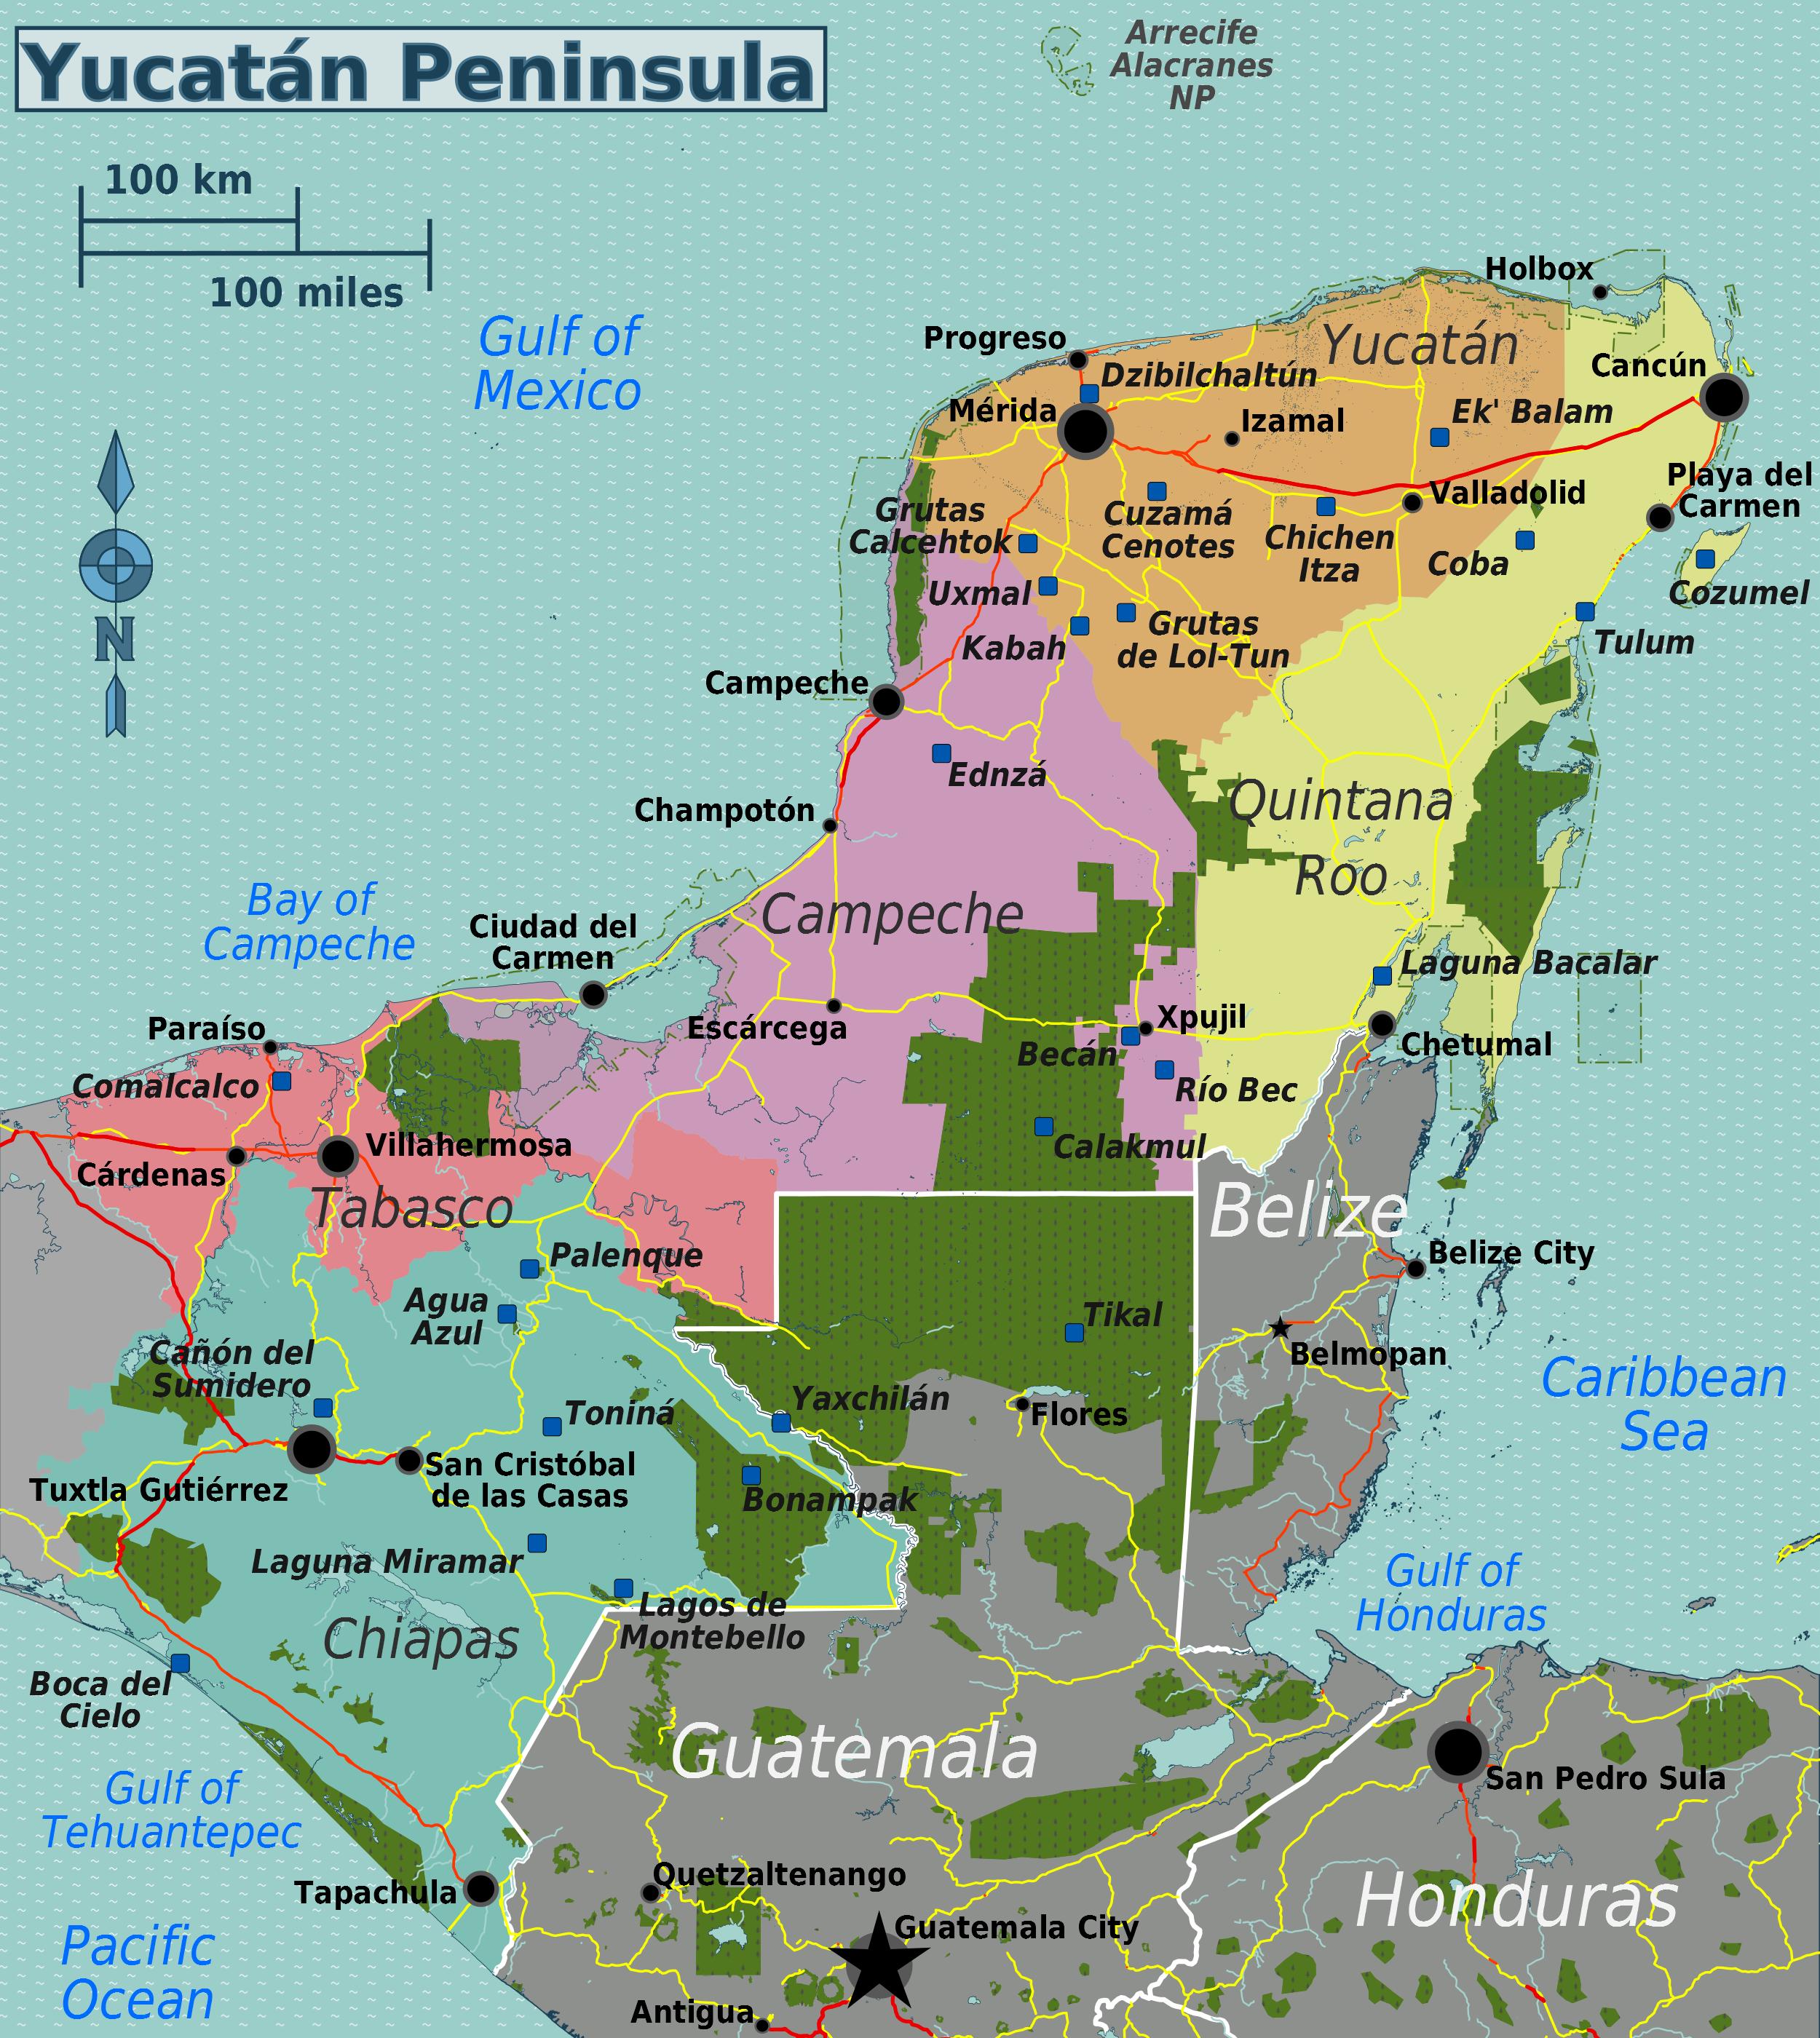 file yucatà n peninsula map wikimedia mons